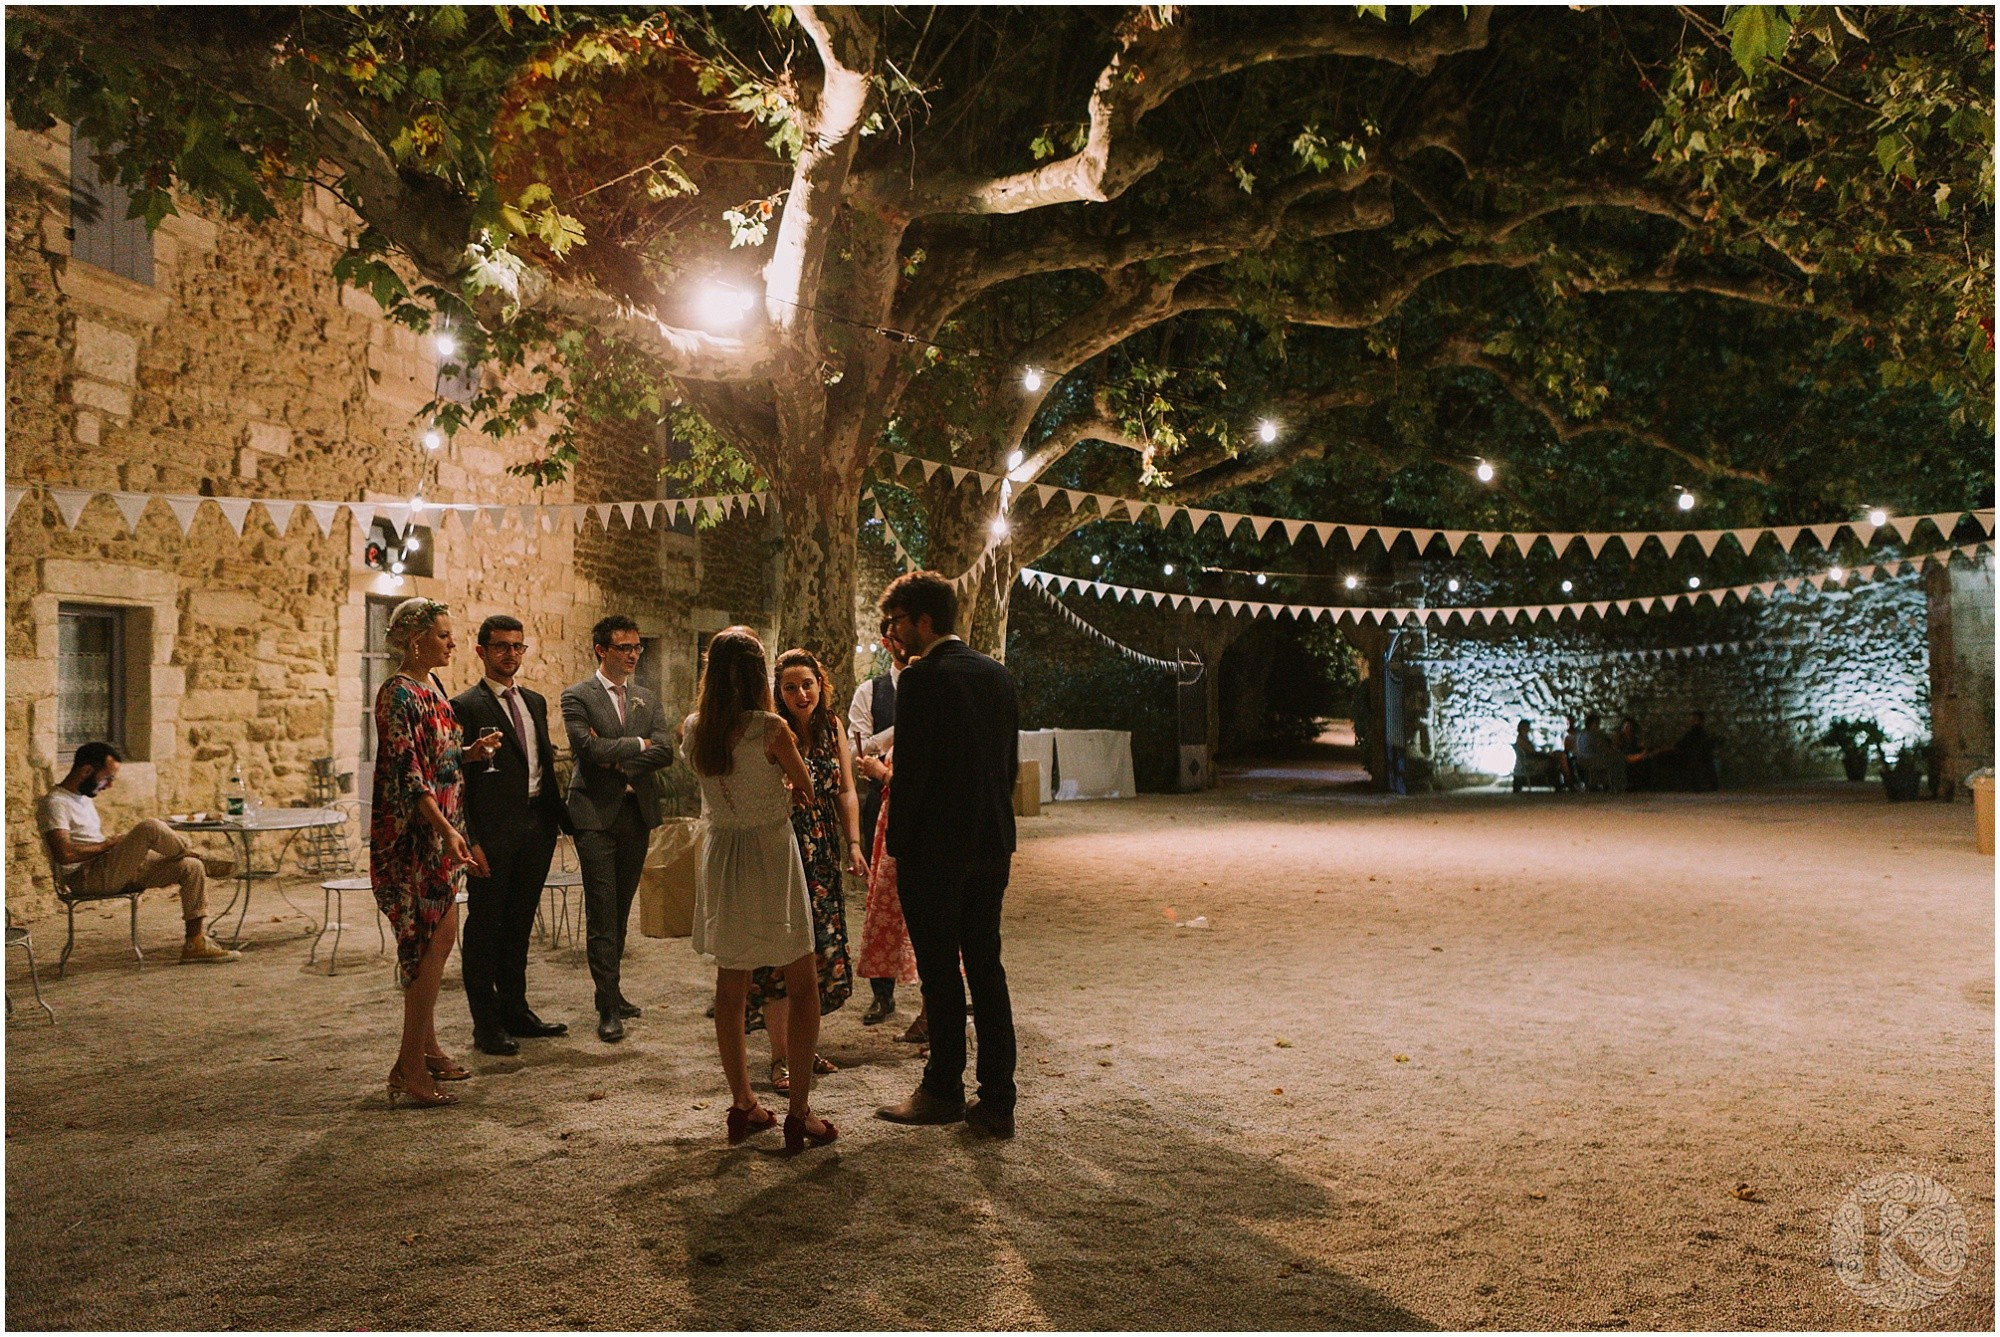 Kateryna-photos-photographe-mariage-vaucluse-provence-avignon-ferme-st-hugues_0101.jpg